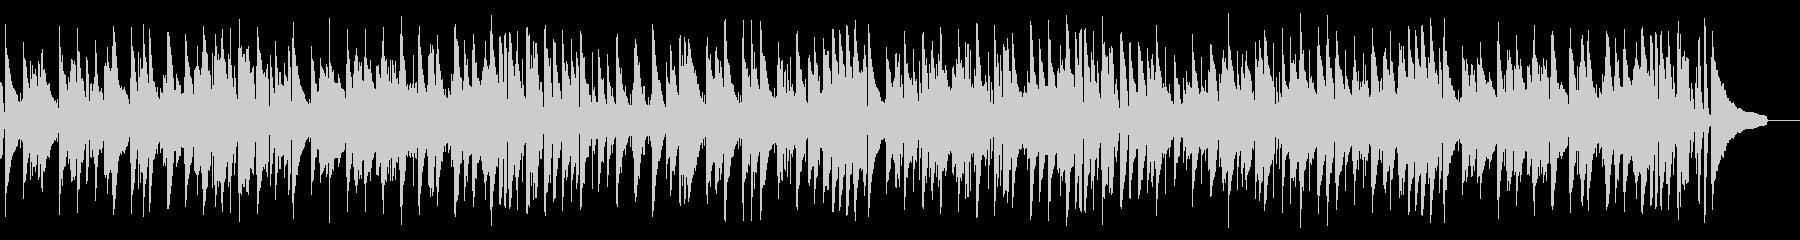 Chopin's masterpiece with elegant jazz's unreproduced waveform